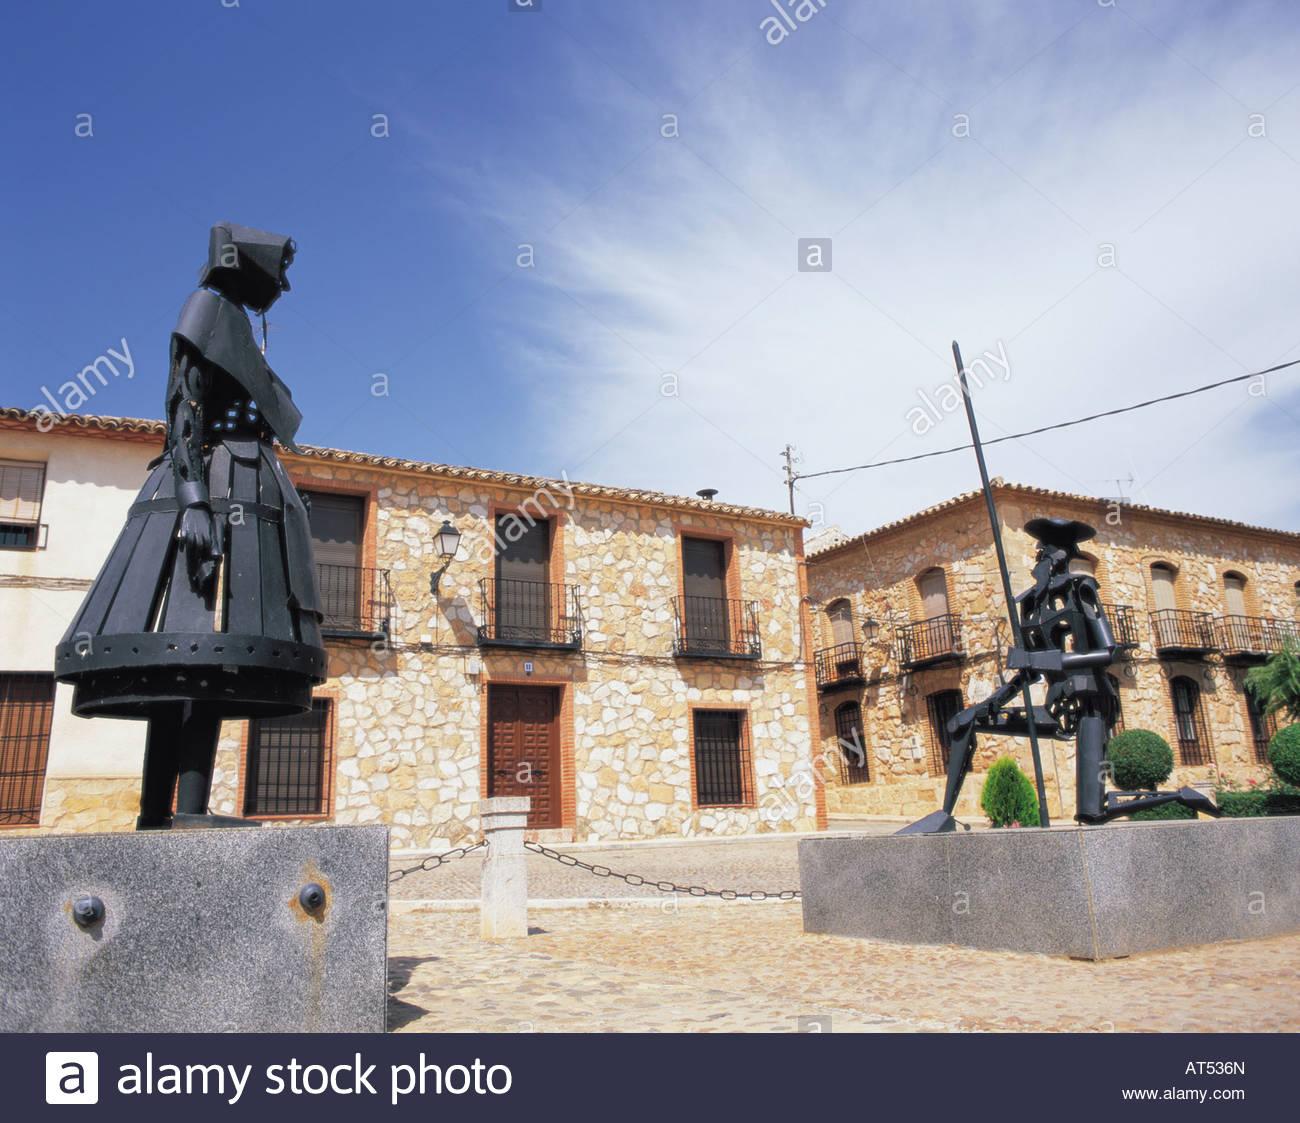 Don Quichotte a Dulcinee, Don Quixote, statue, Juan Carlos I ...